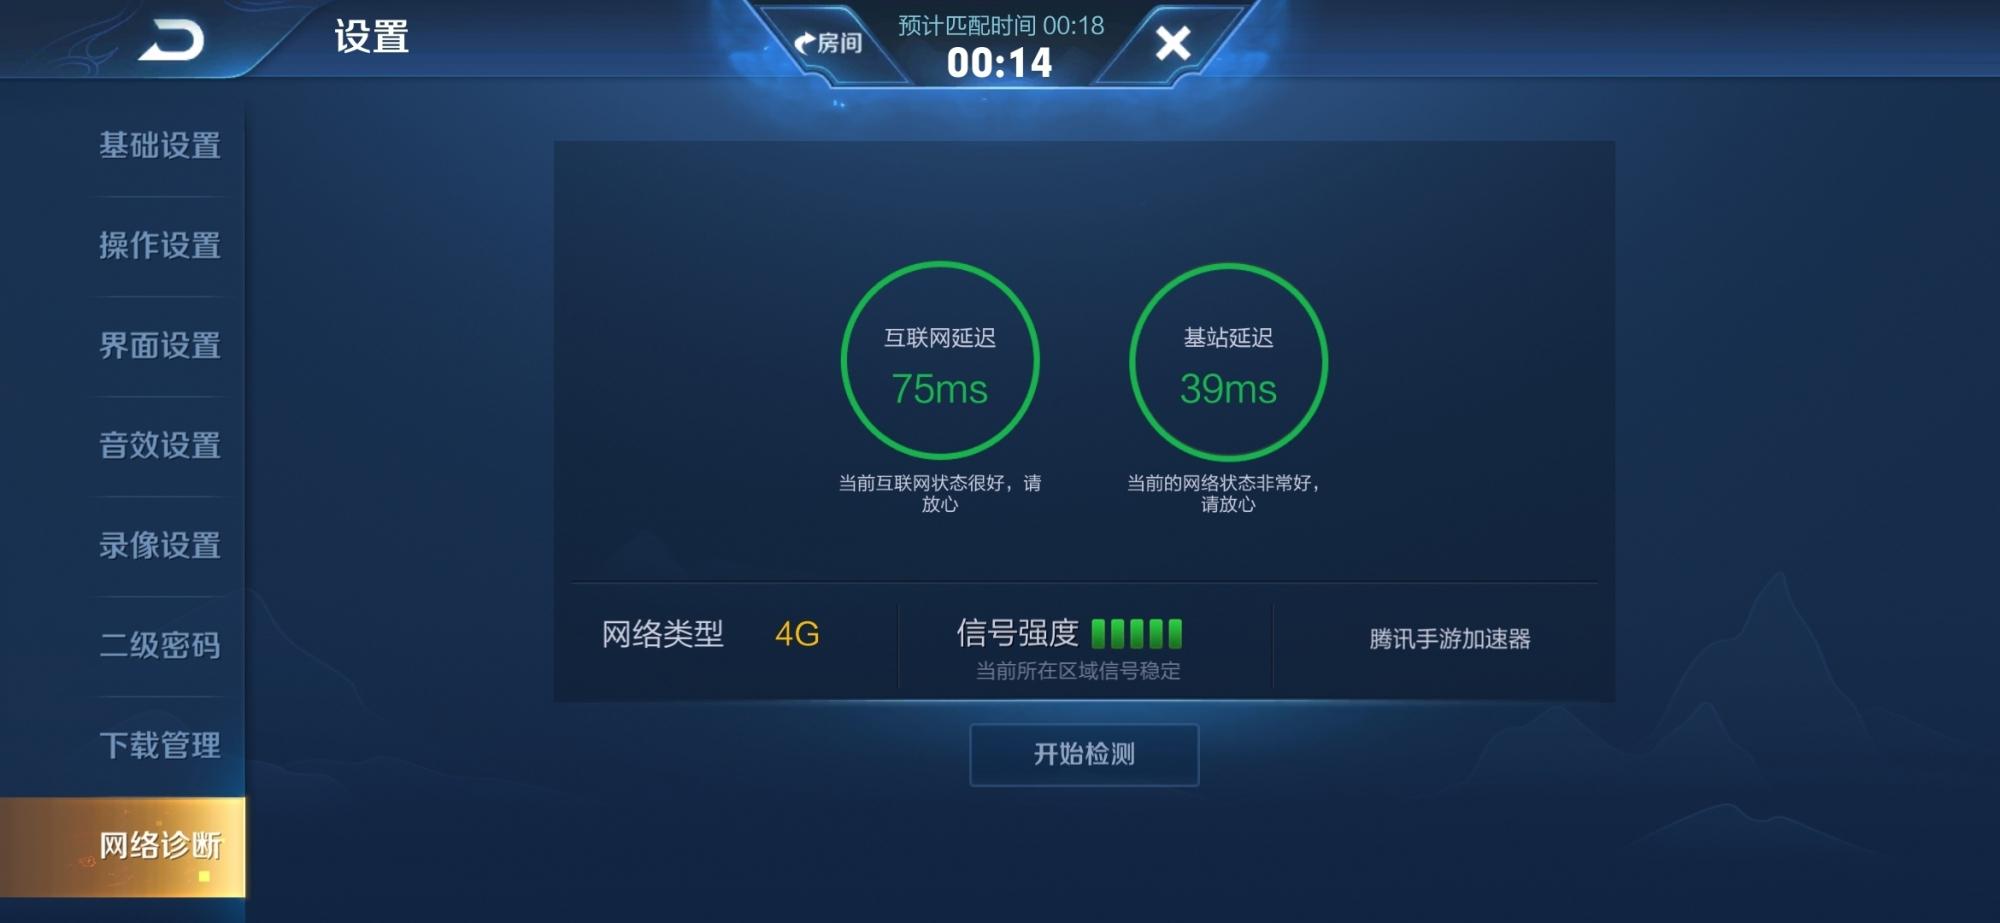 Screenshot_20190525_195204_com.tencent.tmgp.sgame.jpg